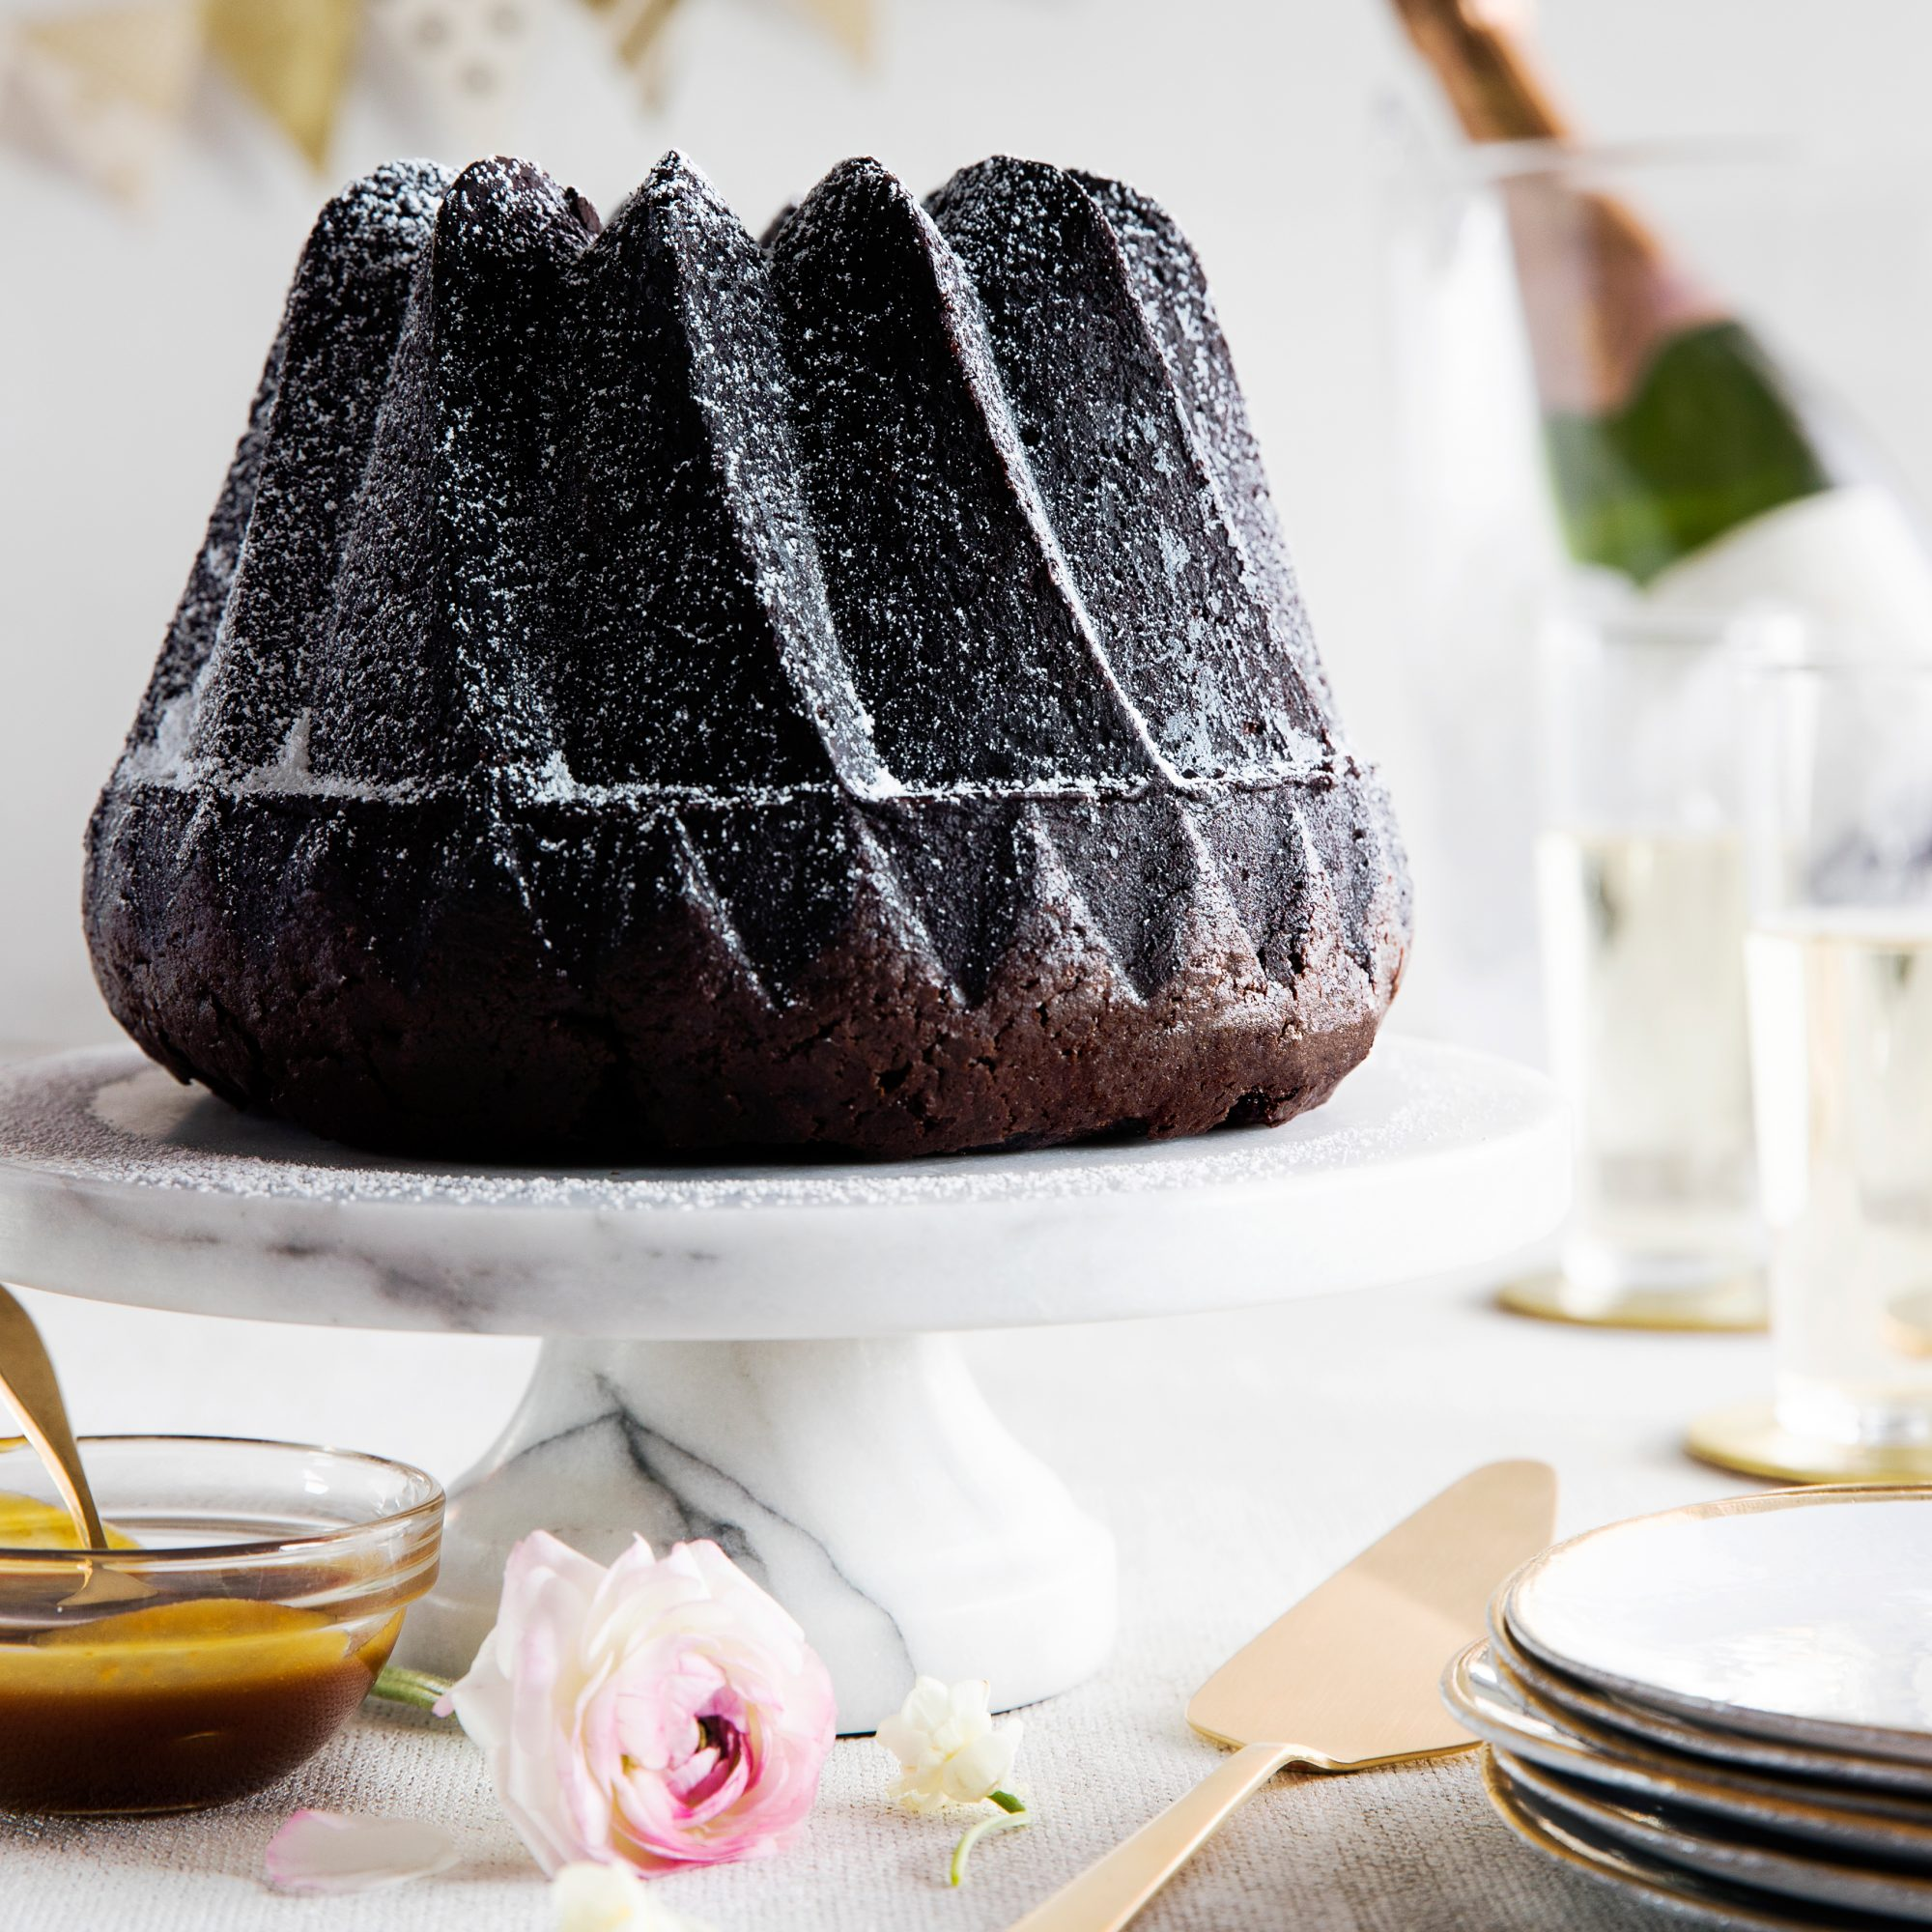 Dark Chocolate Bundt Cake with Whiskey Caramel Sauce